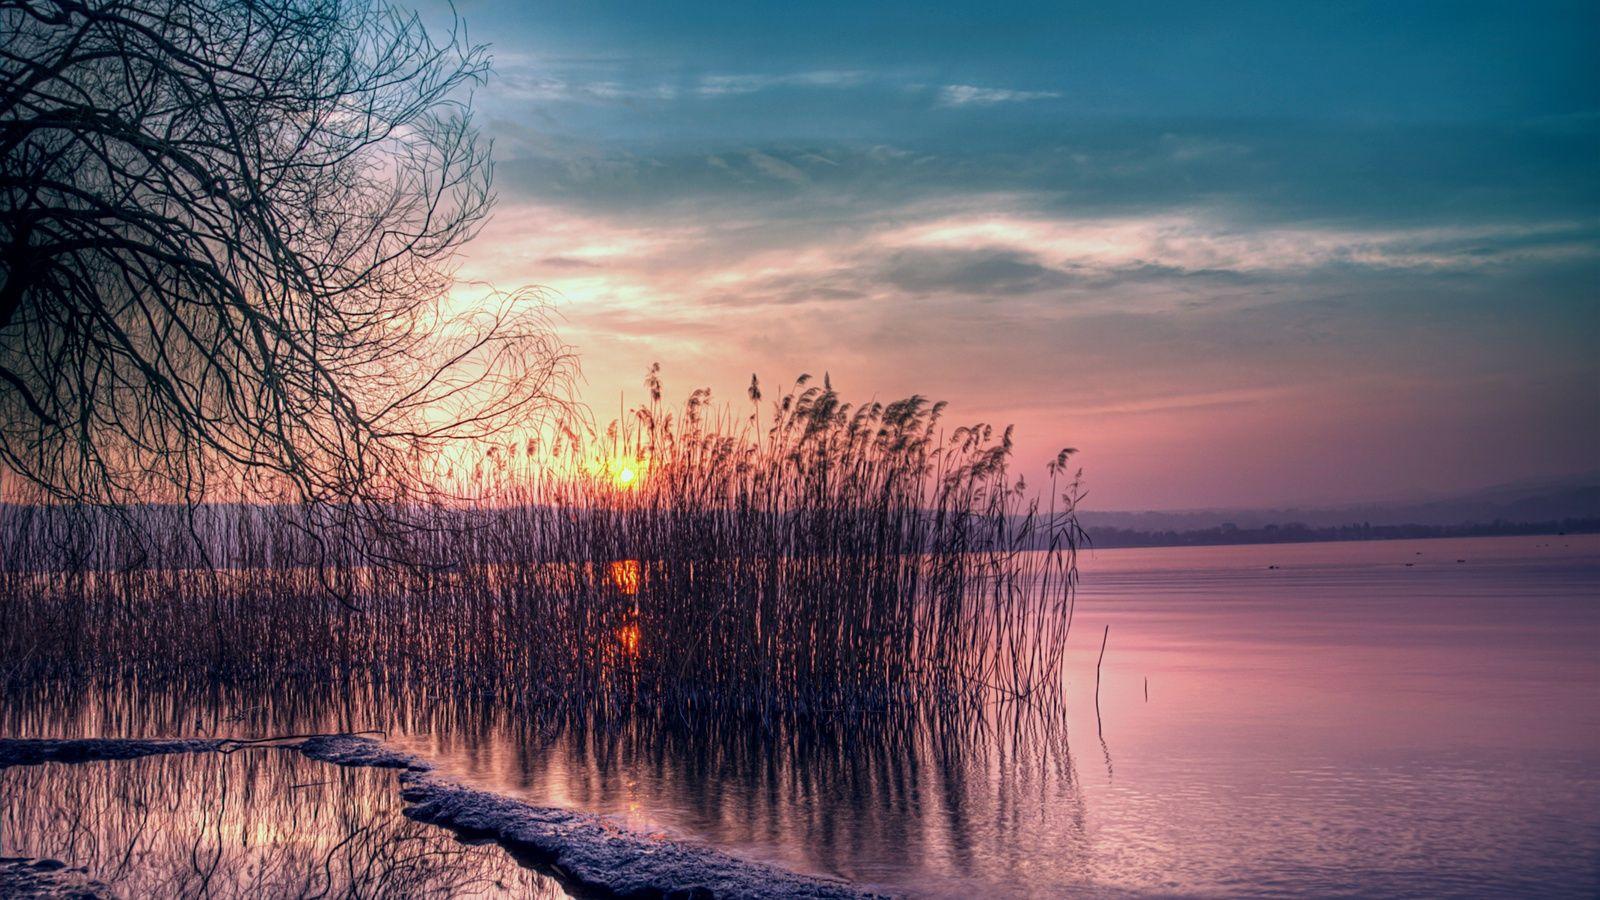 Twilight beautiful landscape quiet lake reed sunset wallpaper 1600x900